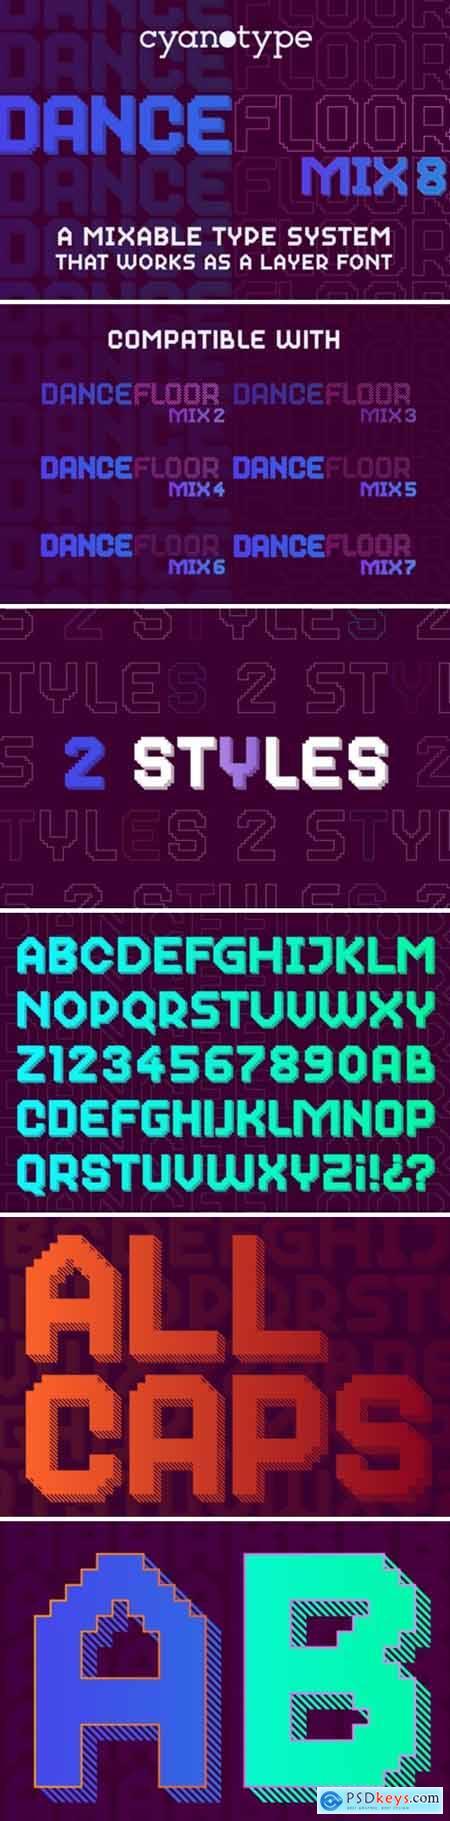 Dance Floor Mix 8 Font